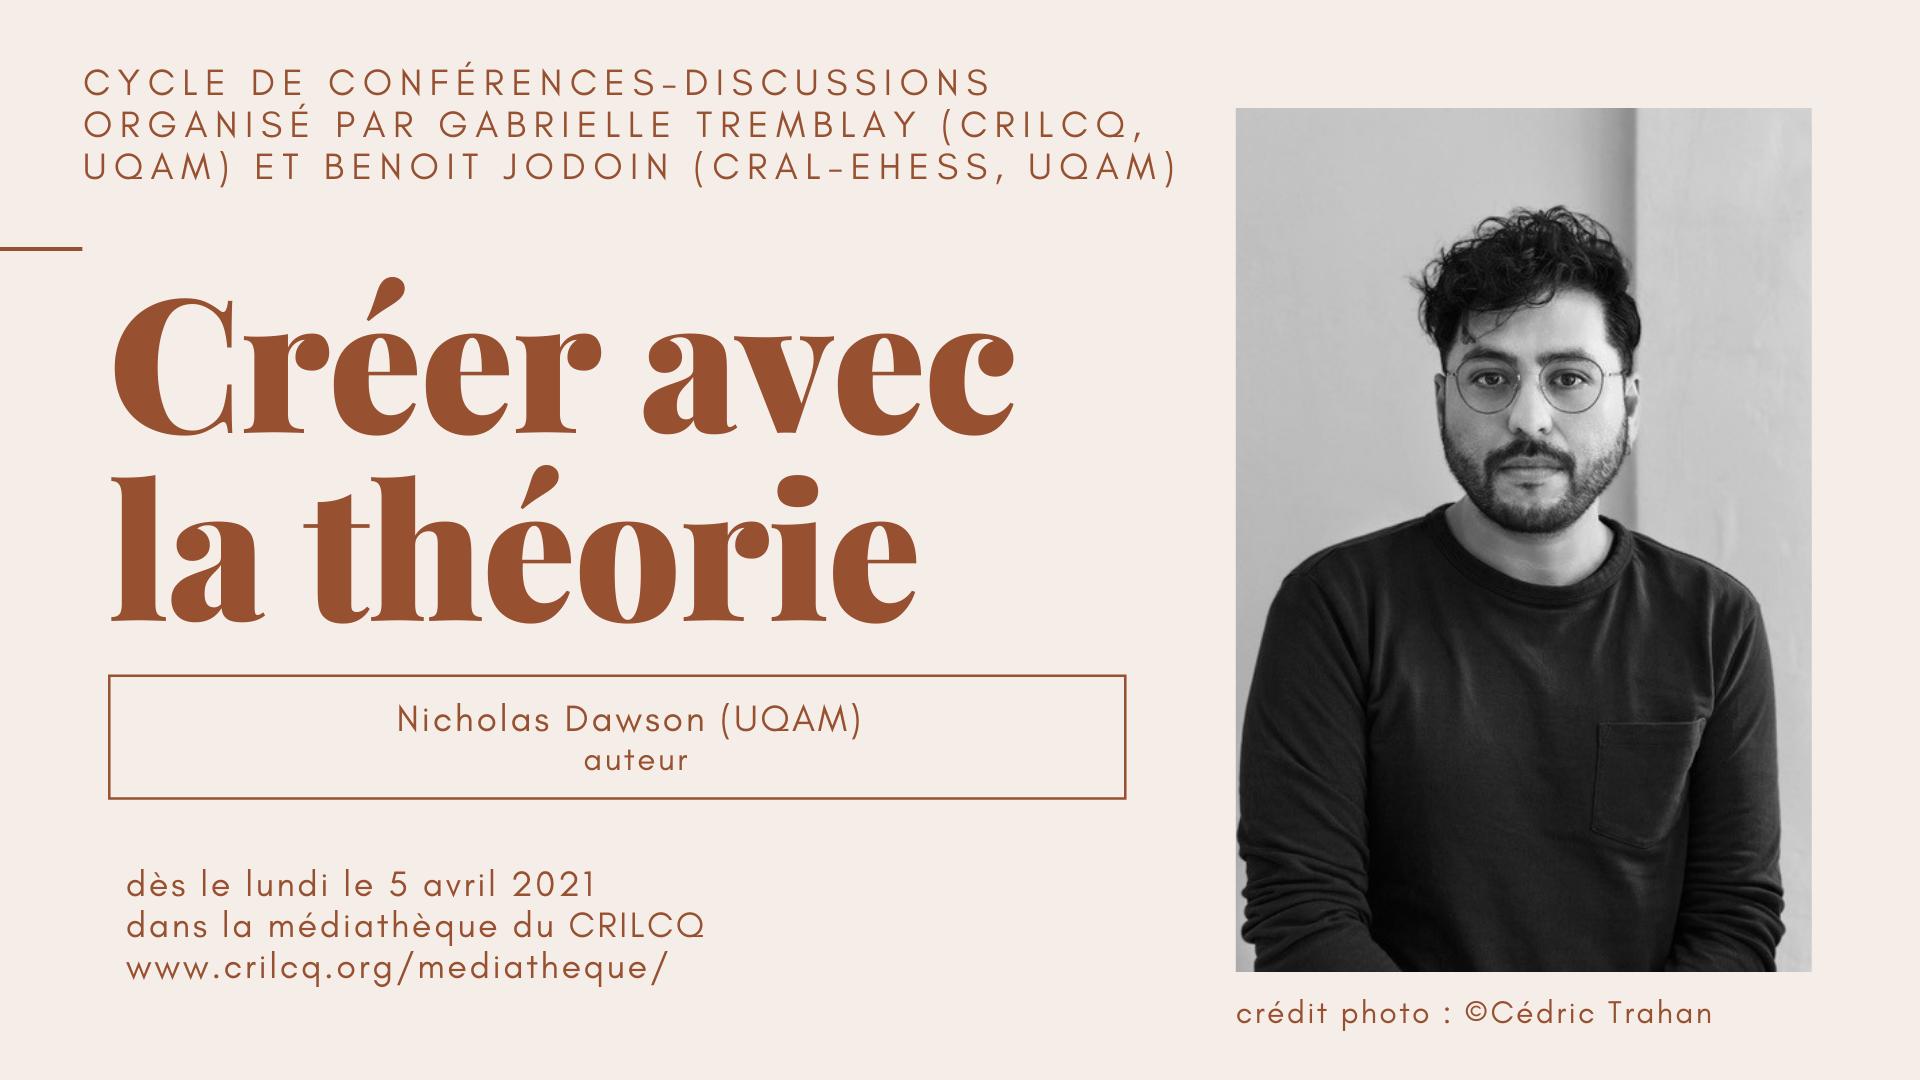 IMAGE-evenement-conference-creer-avec-la-theorie-nicholas-dawson